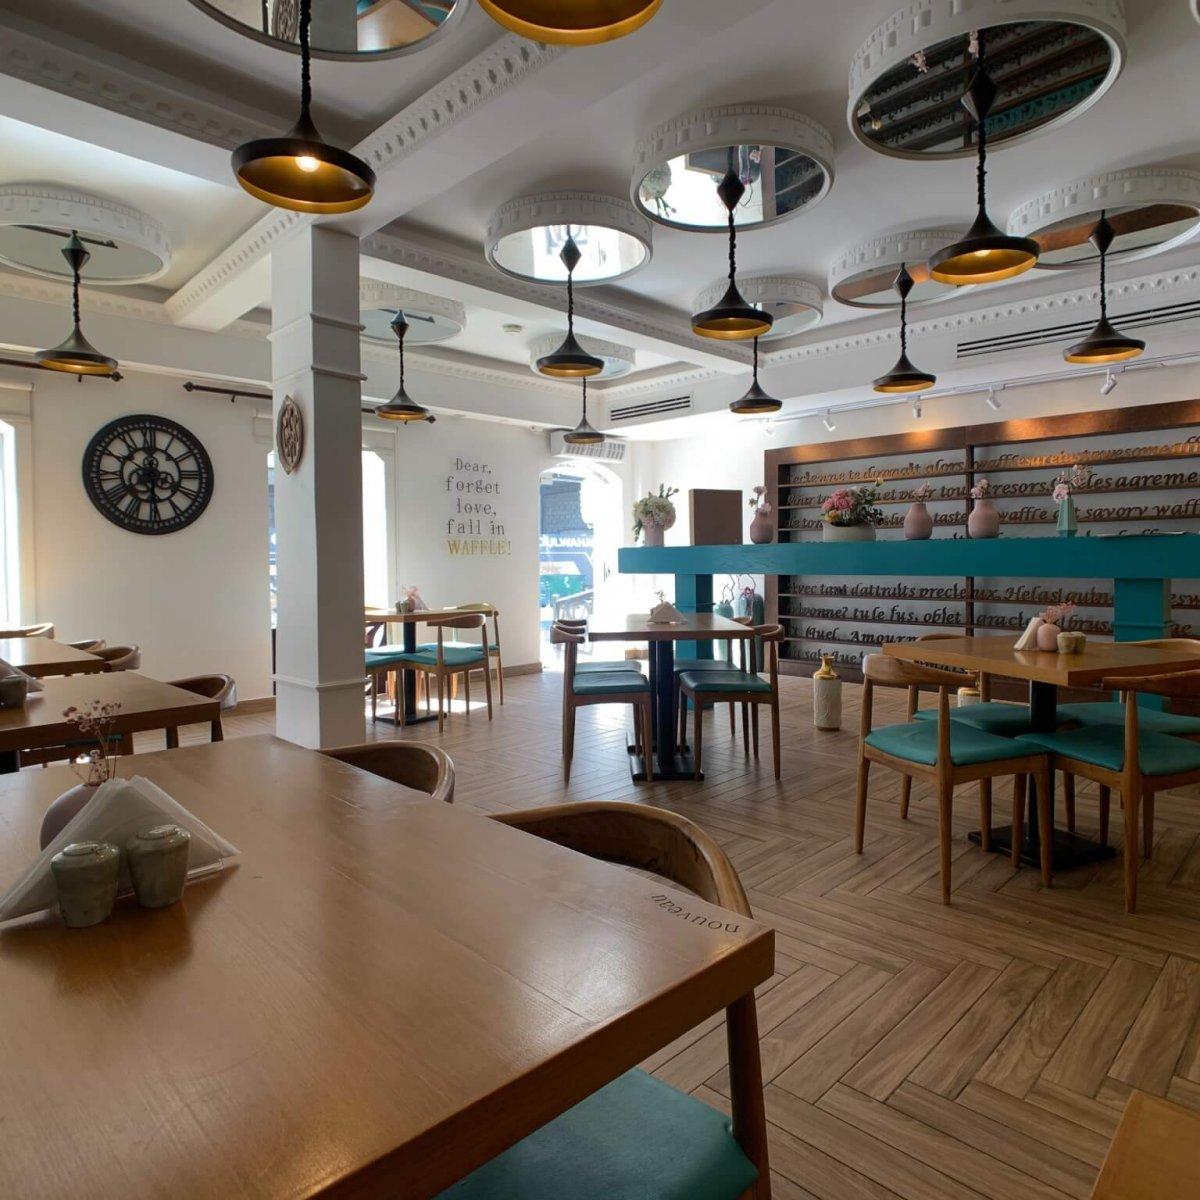 table 7 - National Restaurant Properties